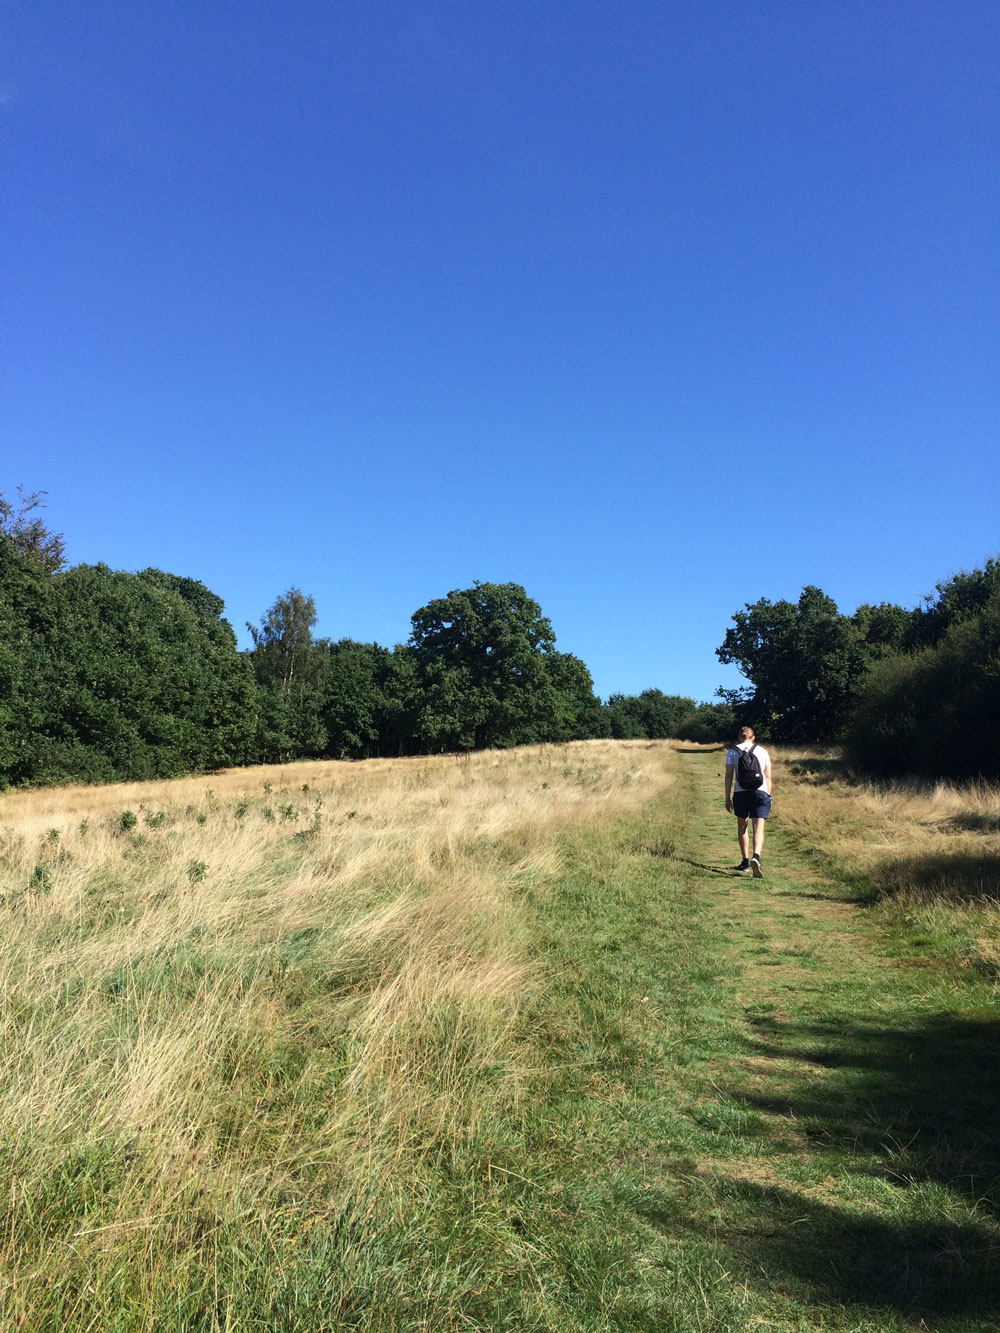 Walking-Epping-Forest-Go-Jauntly-London-woods